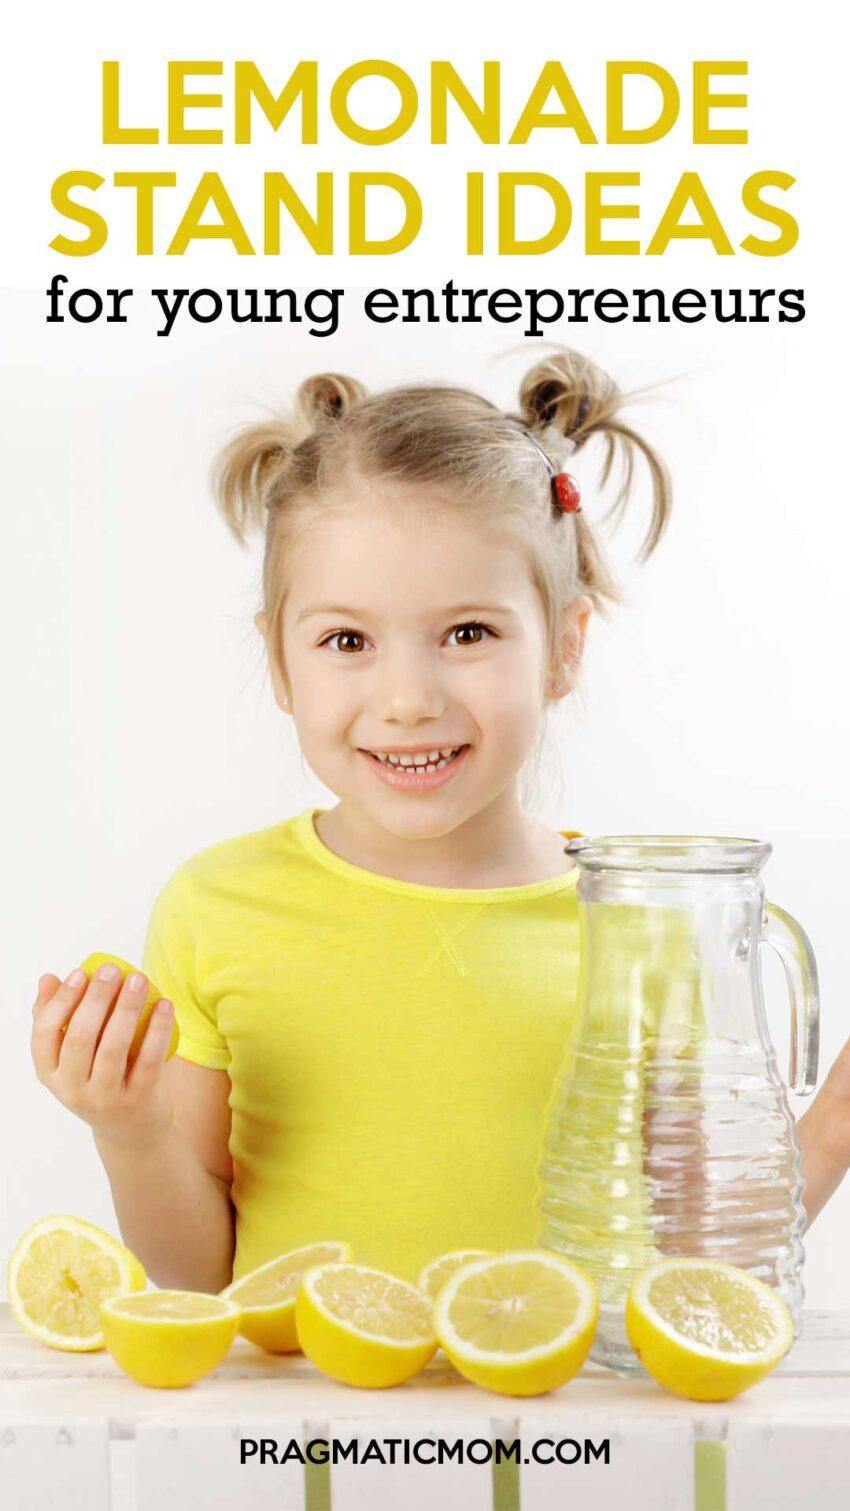 Lemonade Stand Ideas for Young Entrepreneurs